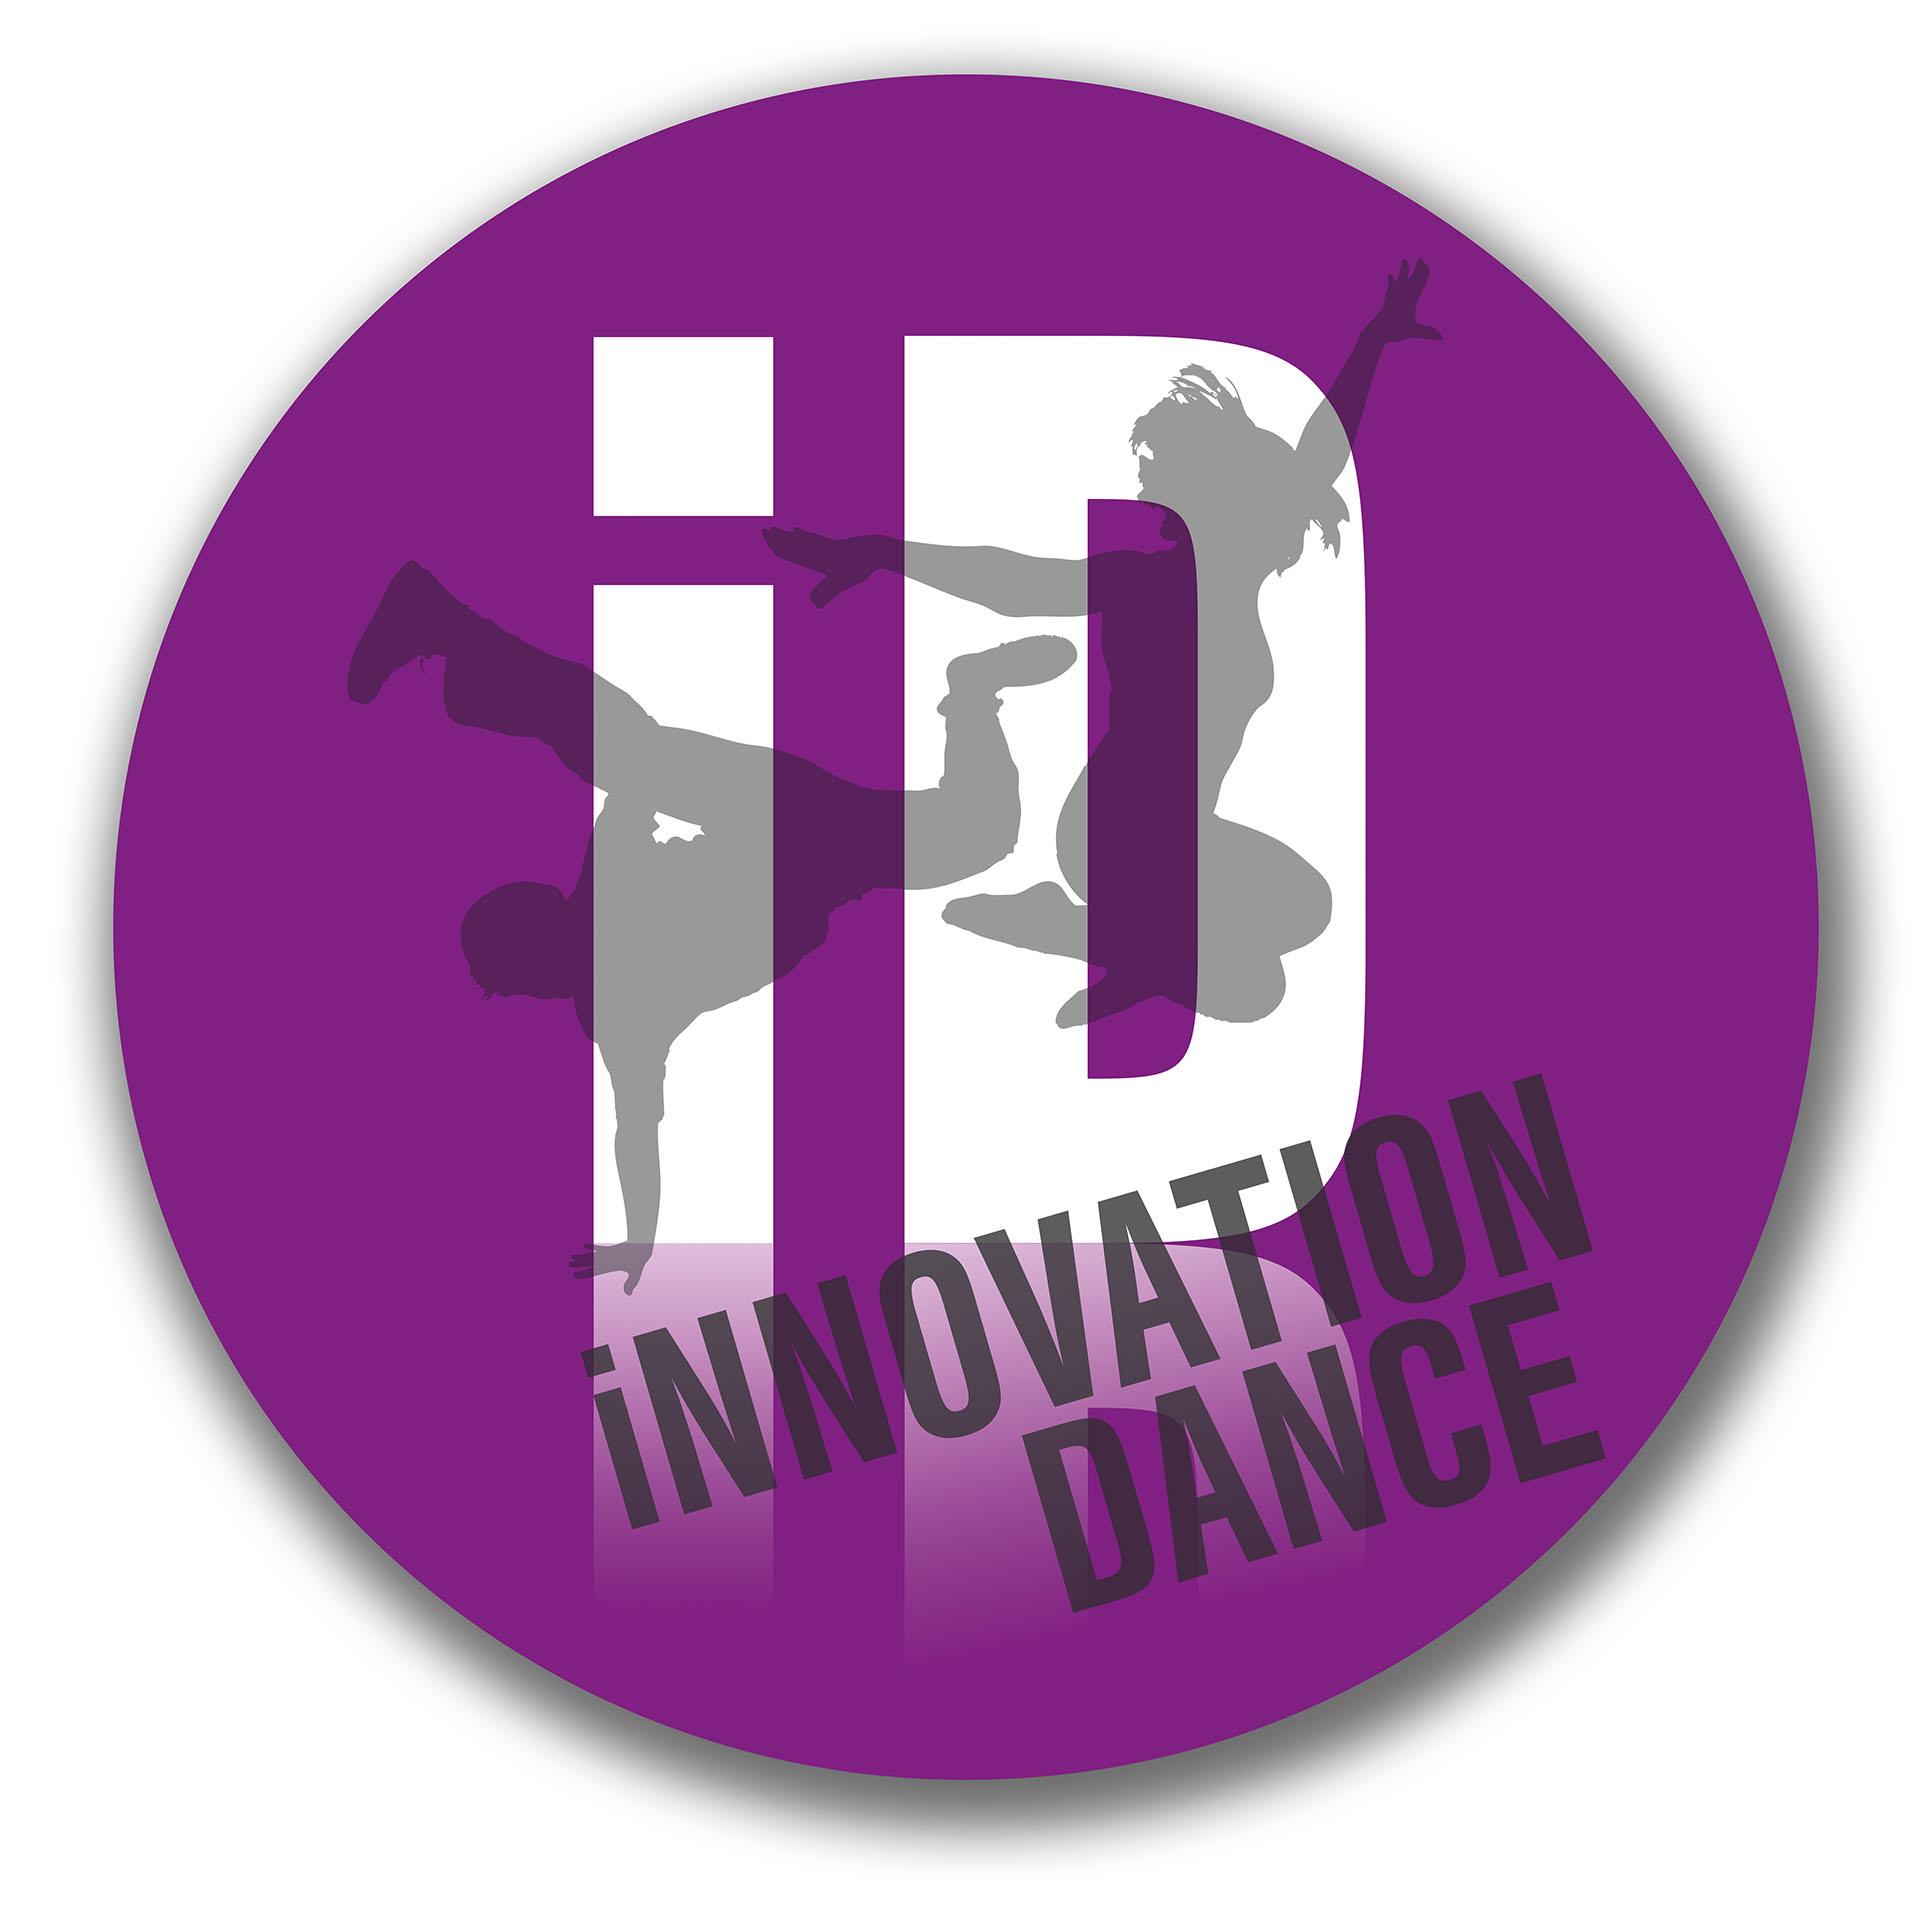 Innovation Dance Studios's logo